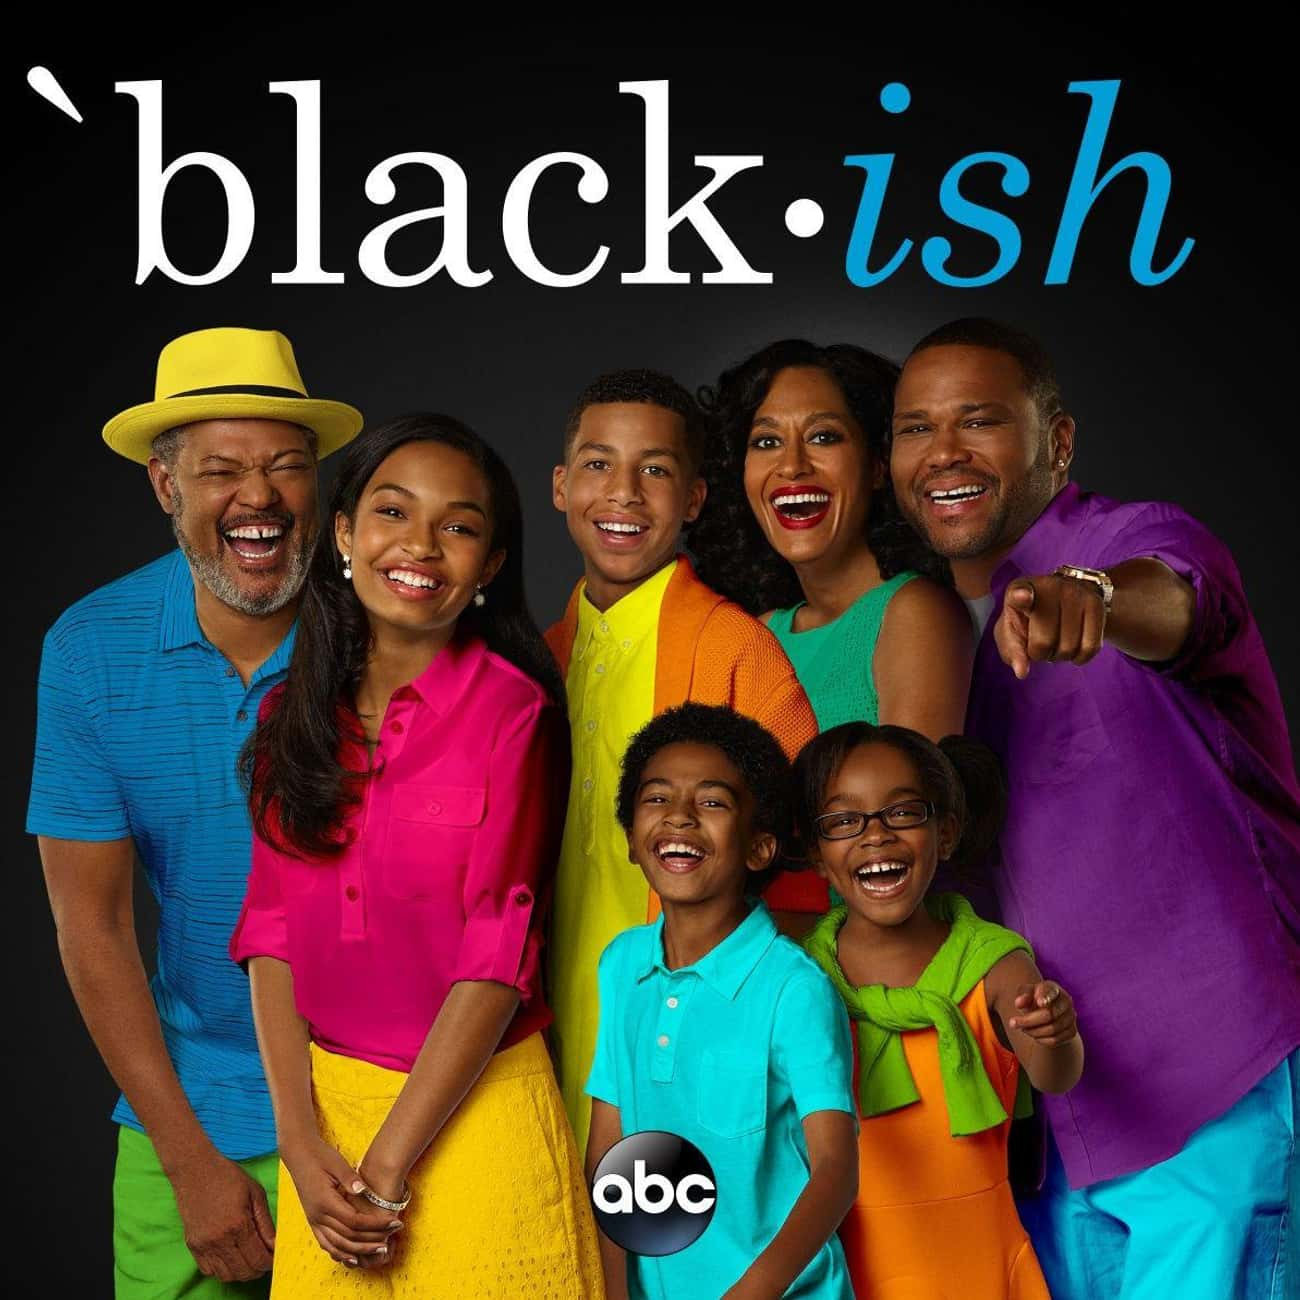 Blackish - Season 1 is listed (or ranked) 1 on the list Ranking the Best Seasons of 'Black-ish'